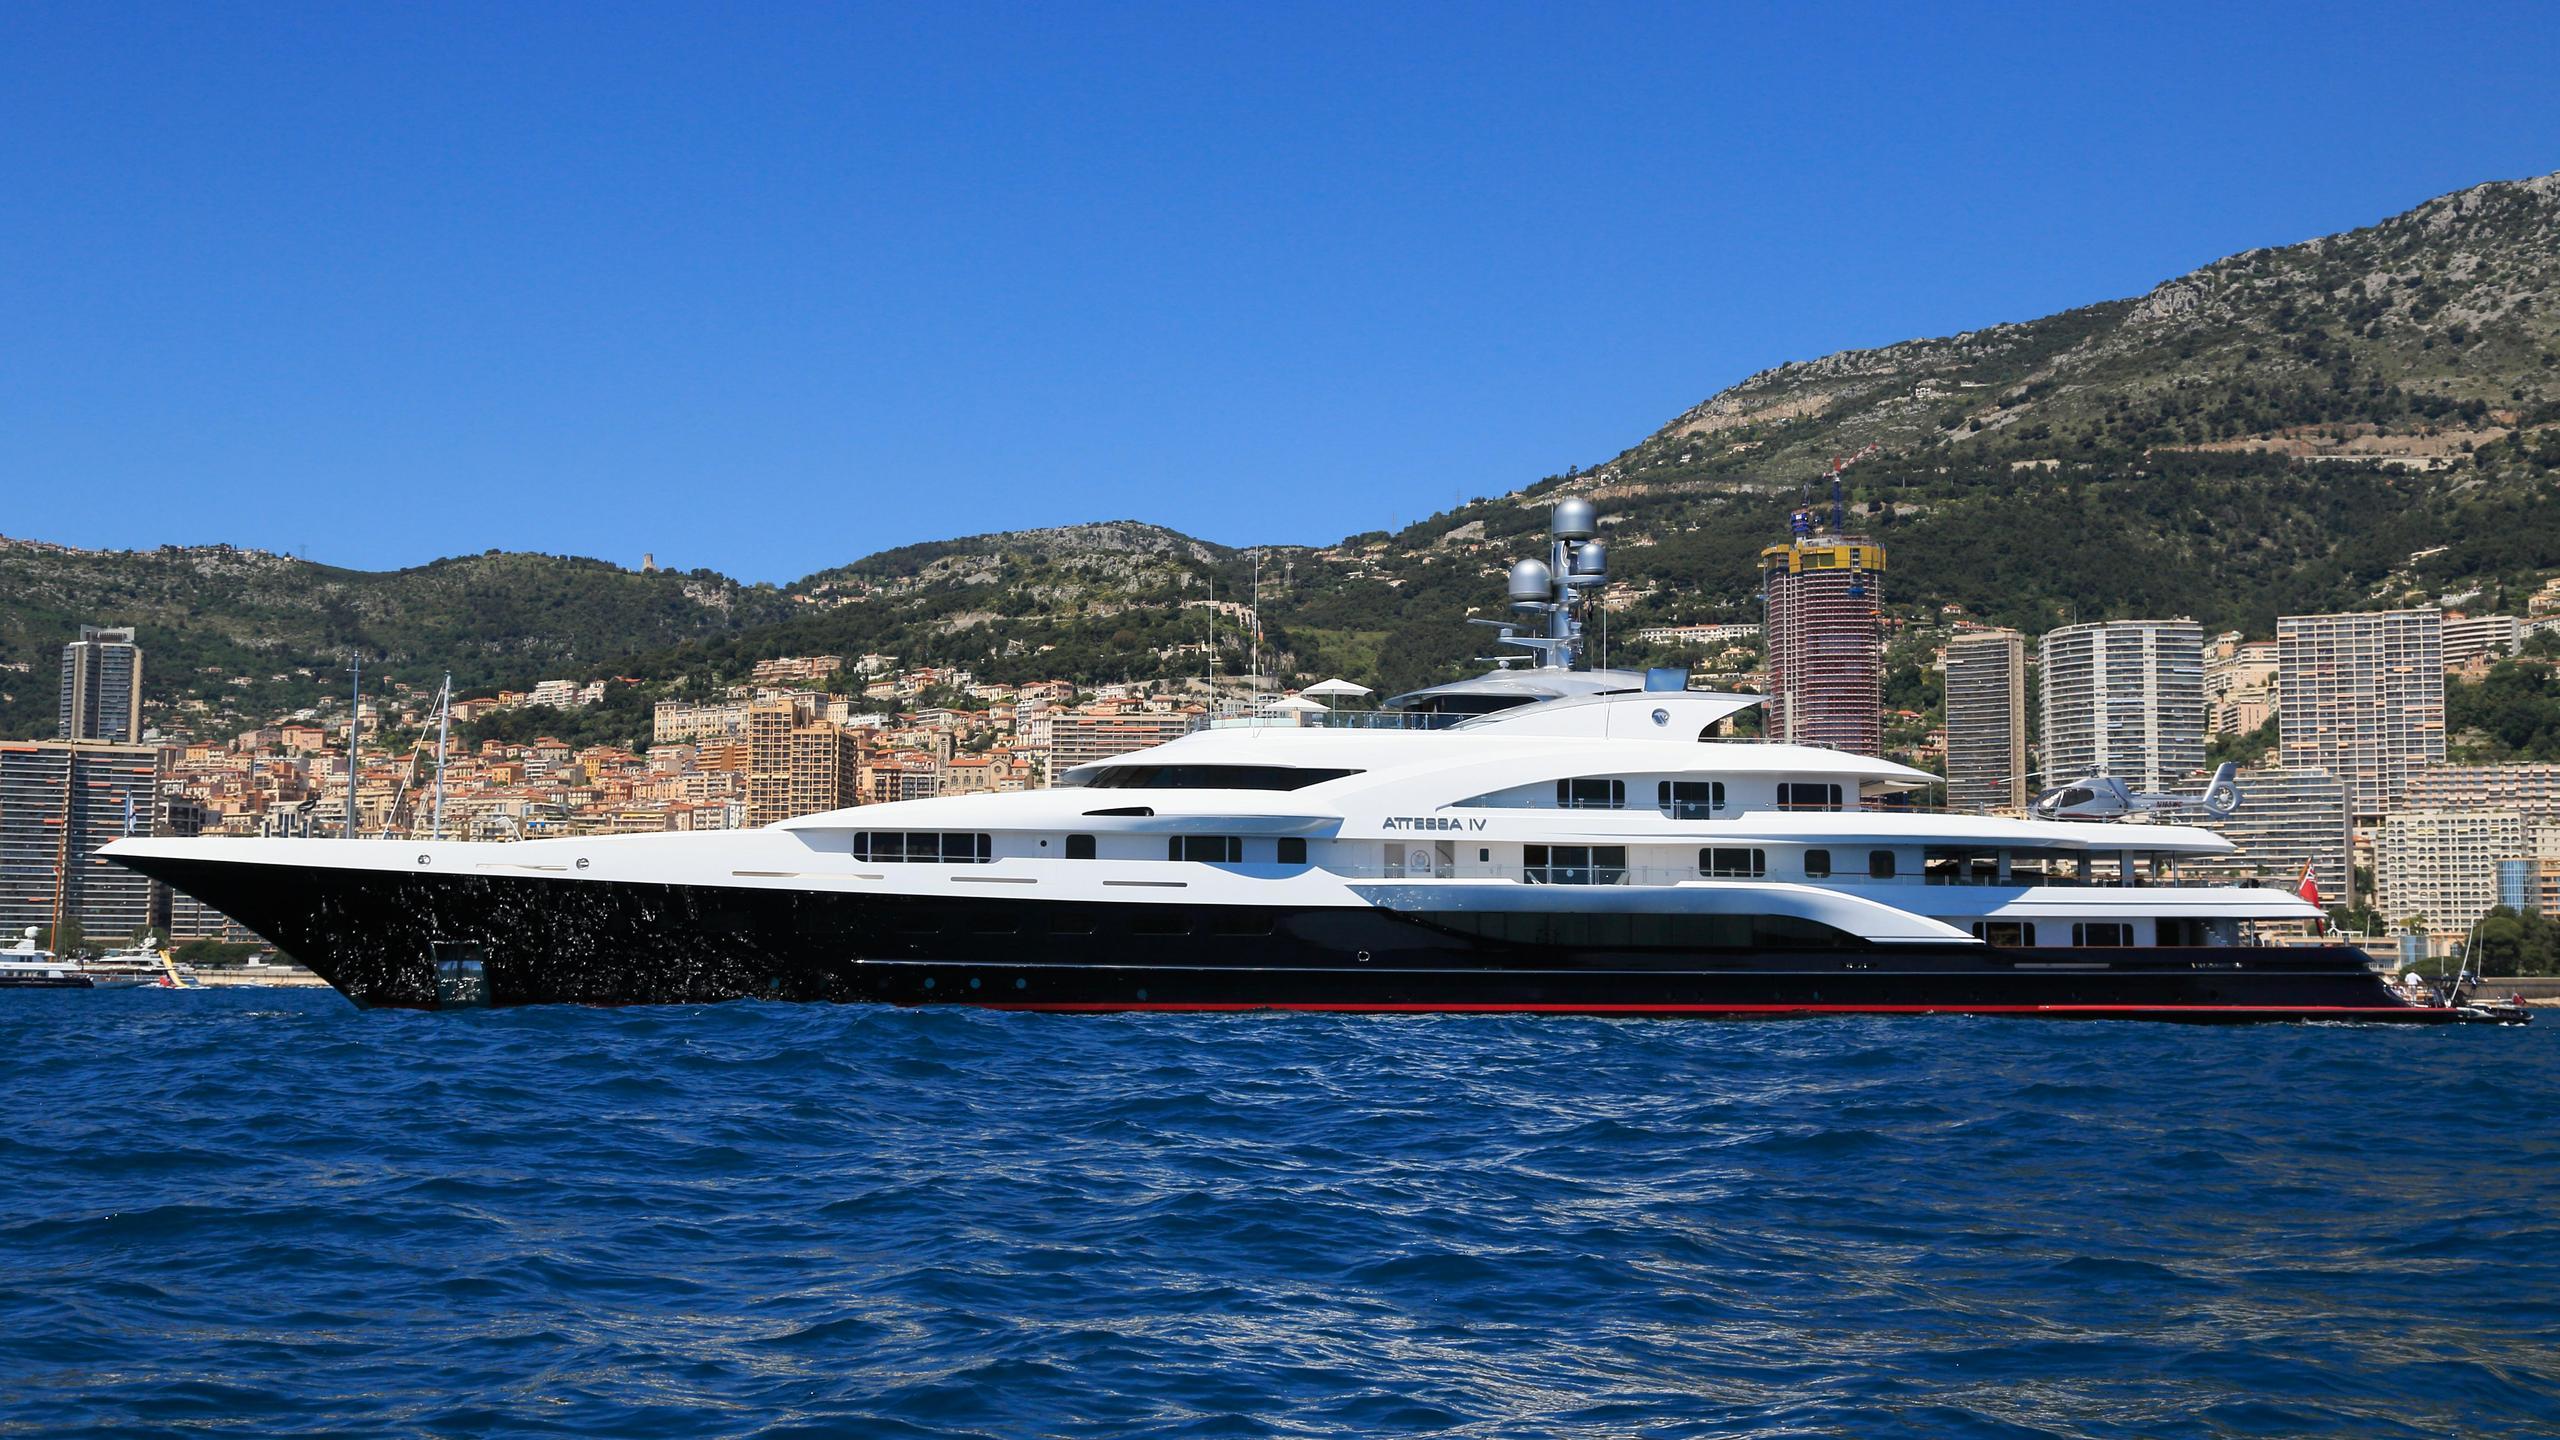 Attessa-IV-motor-yacht-hayashikane-1999-101m-profile-mediterranean